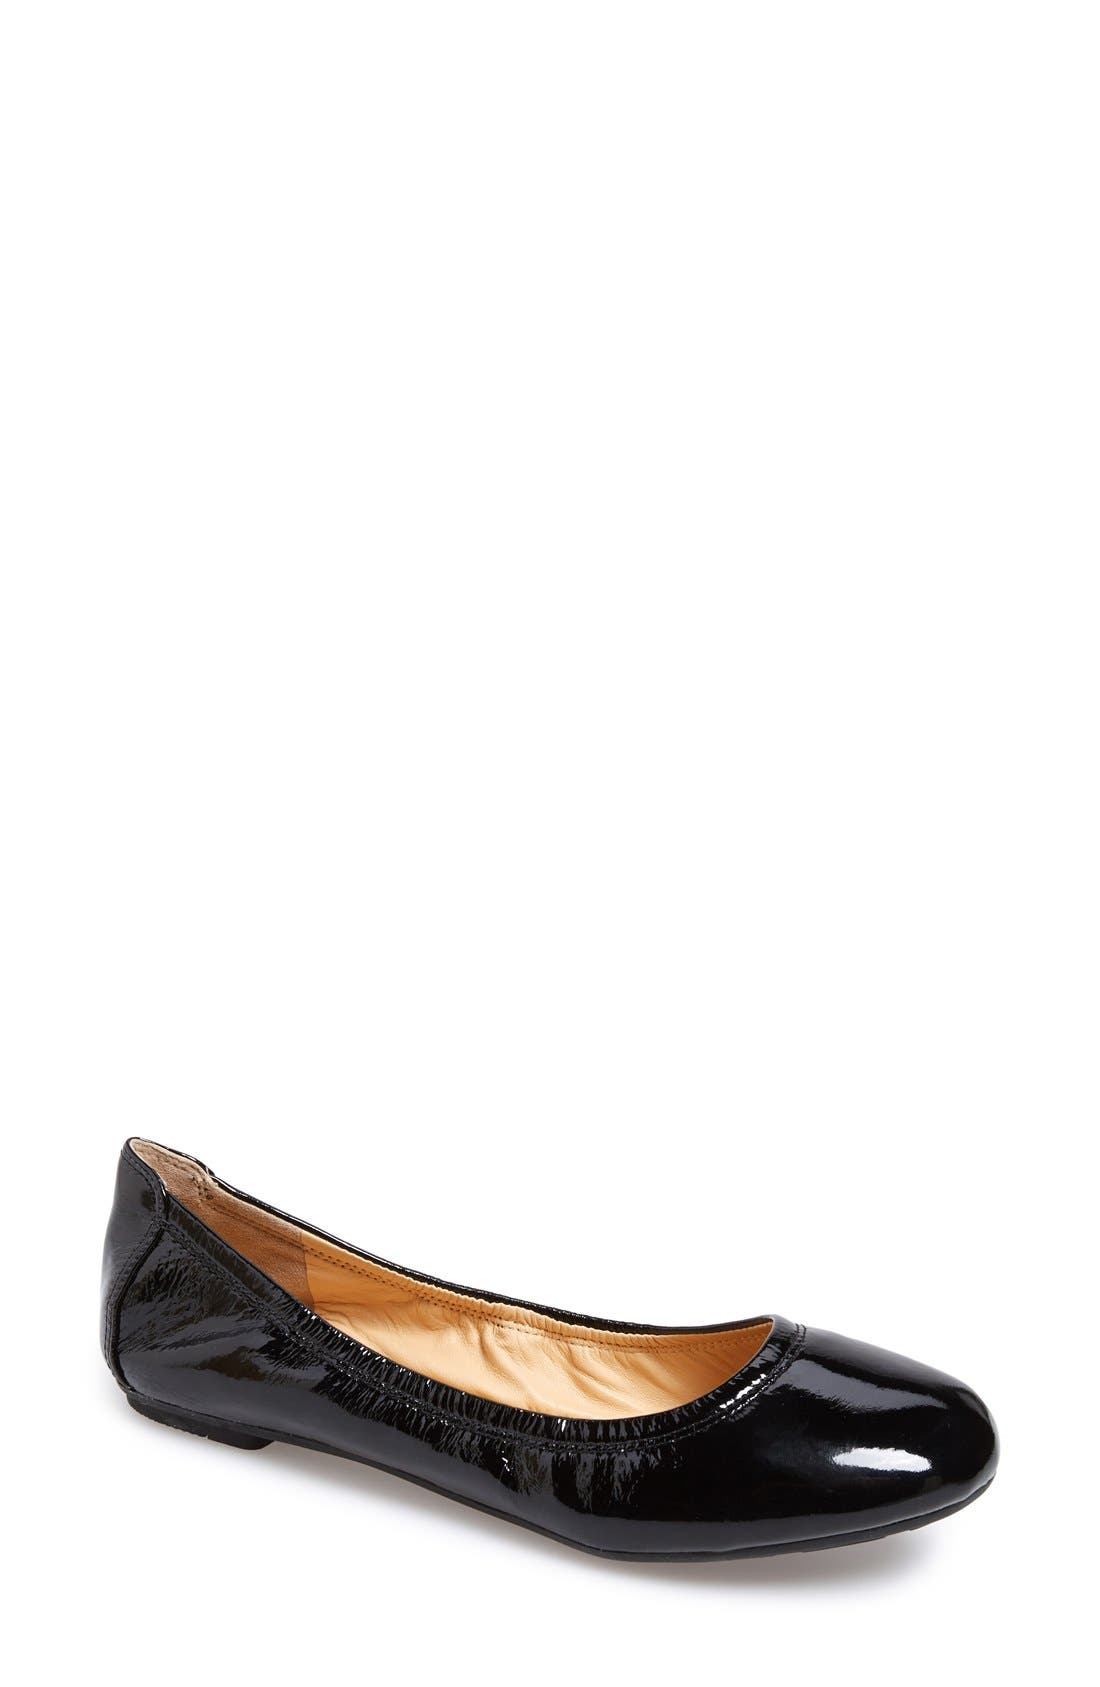 Main Image - Cole Haan 'Manhattan' Leather Ballet Flat (Women)